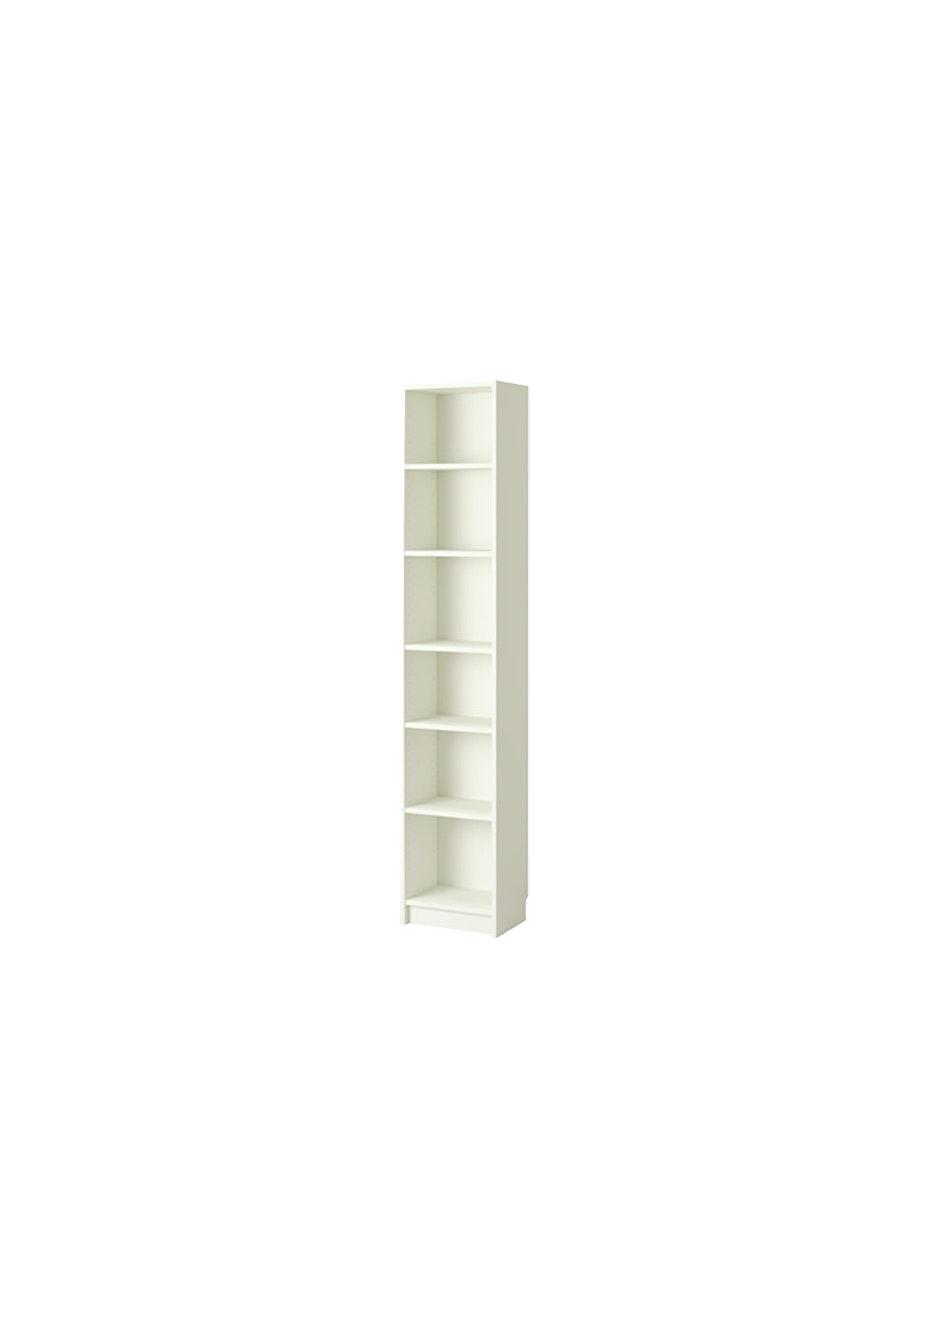 Ikea Billy Bookcase 40x202cm White